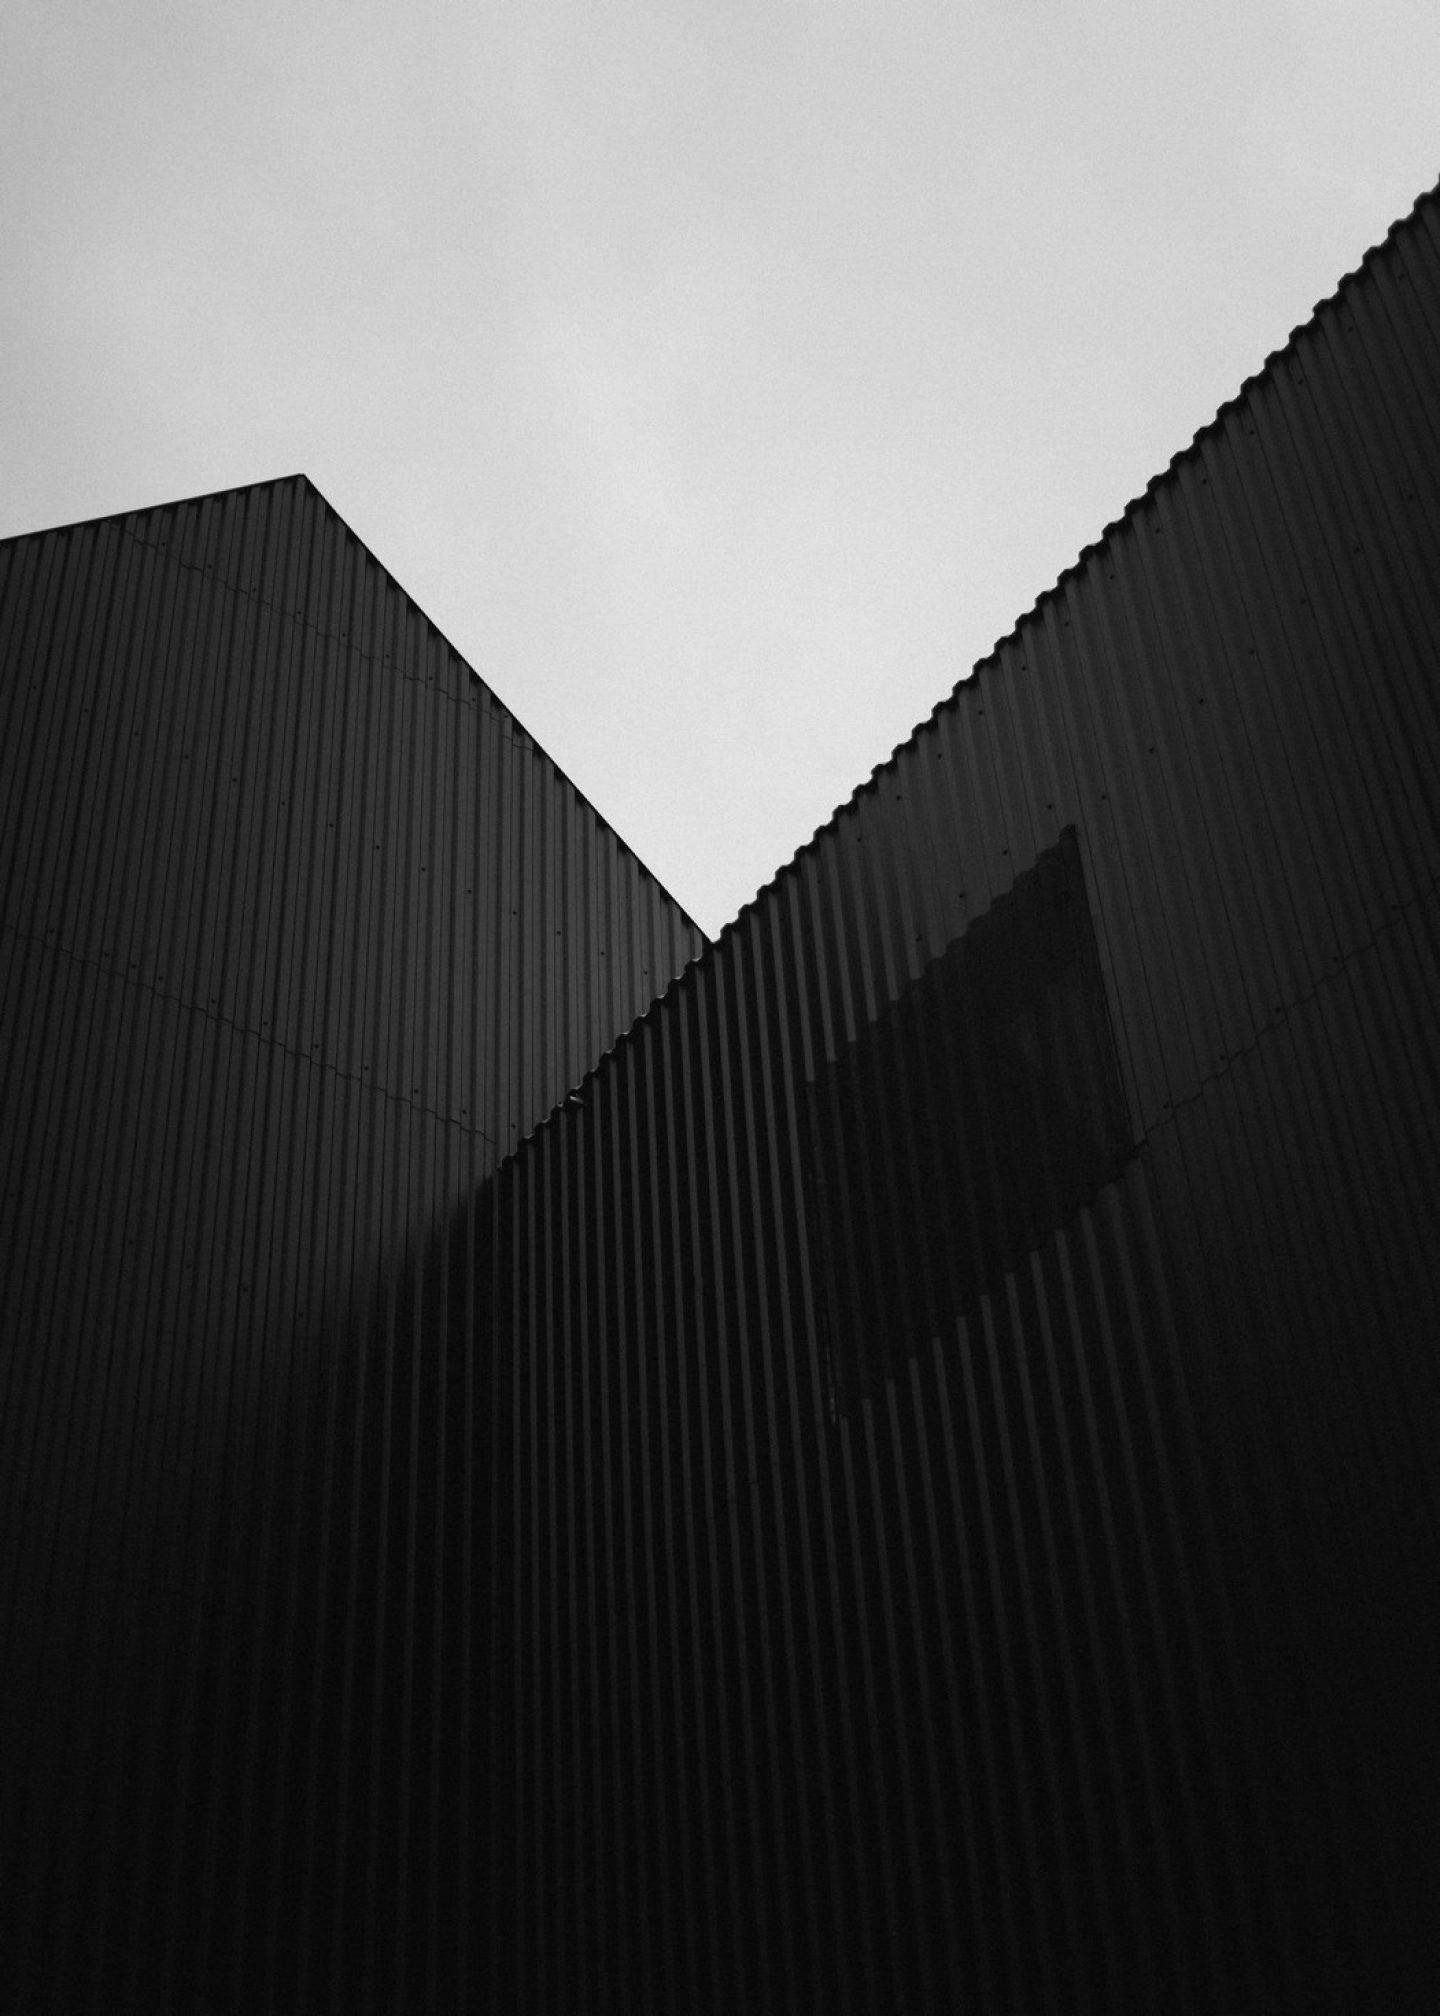 kim_holtermand_architecture-1-kopiowanie